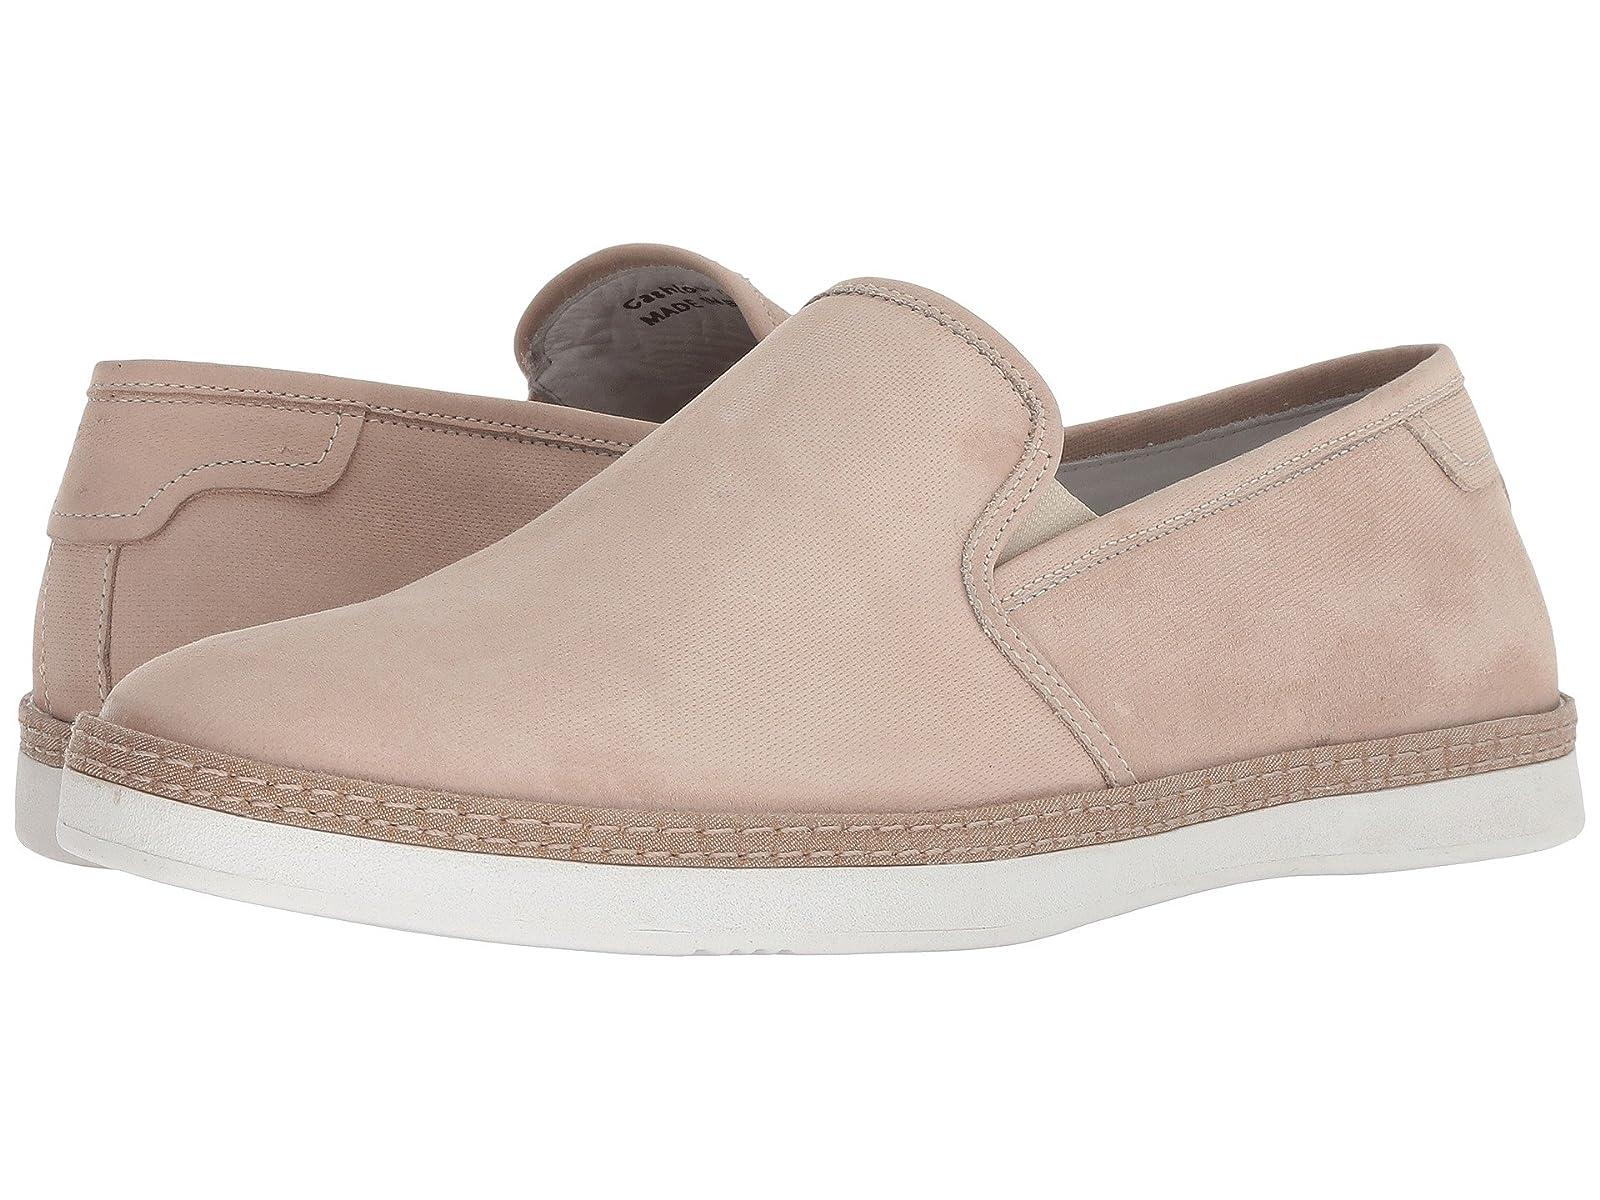 Donald J Pliner CashtonAtmospheric grades have affordable shoes